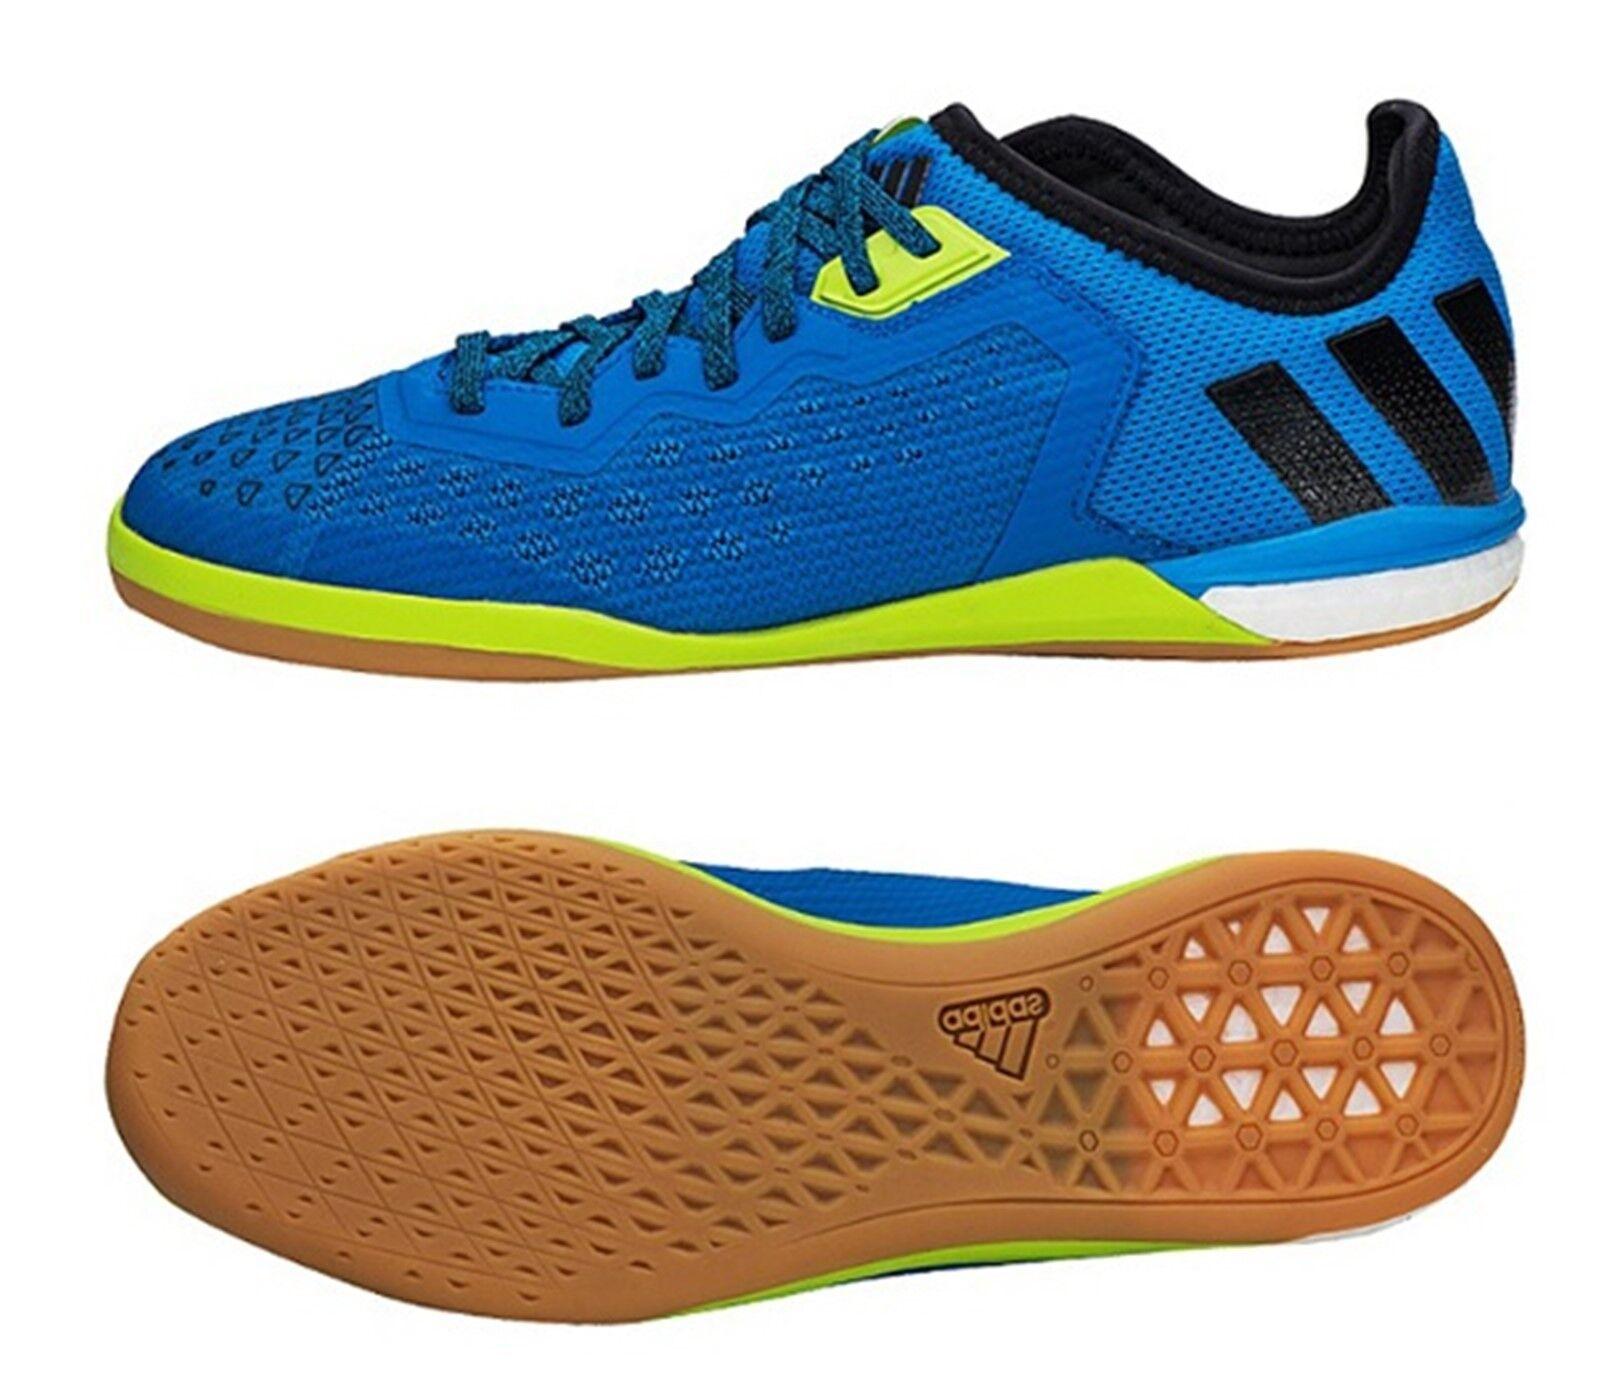 Adidas Men ACE 16.1 Court Indoor Blau Futsal Soccer schuhe Stiefelschuhe AF4250